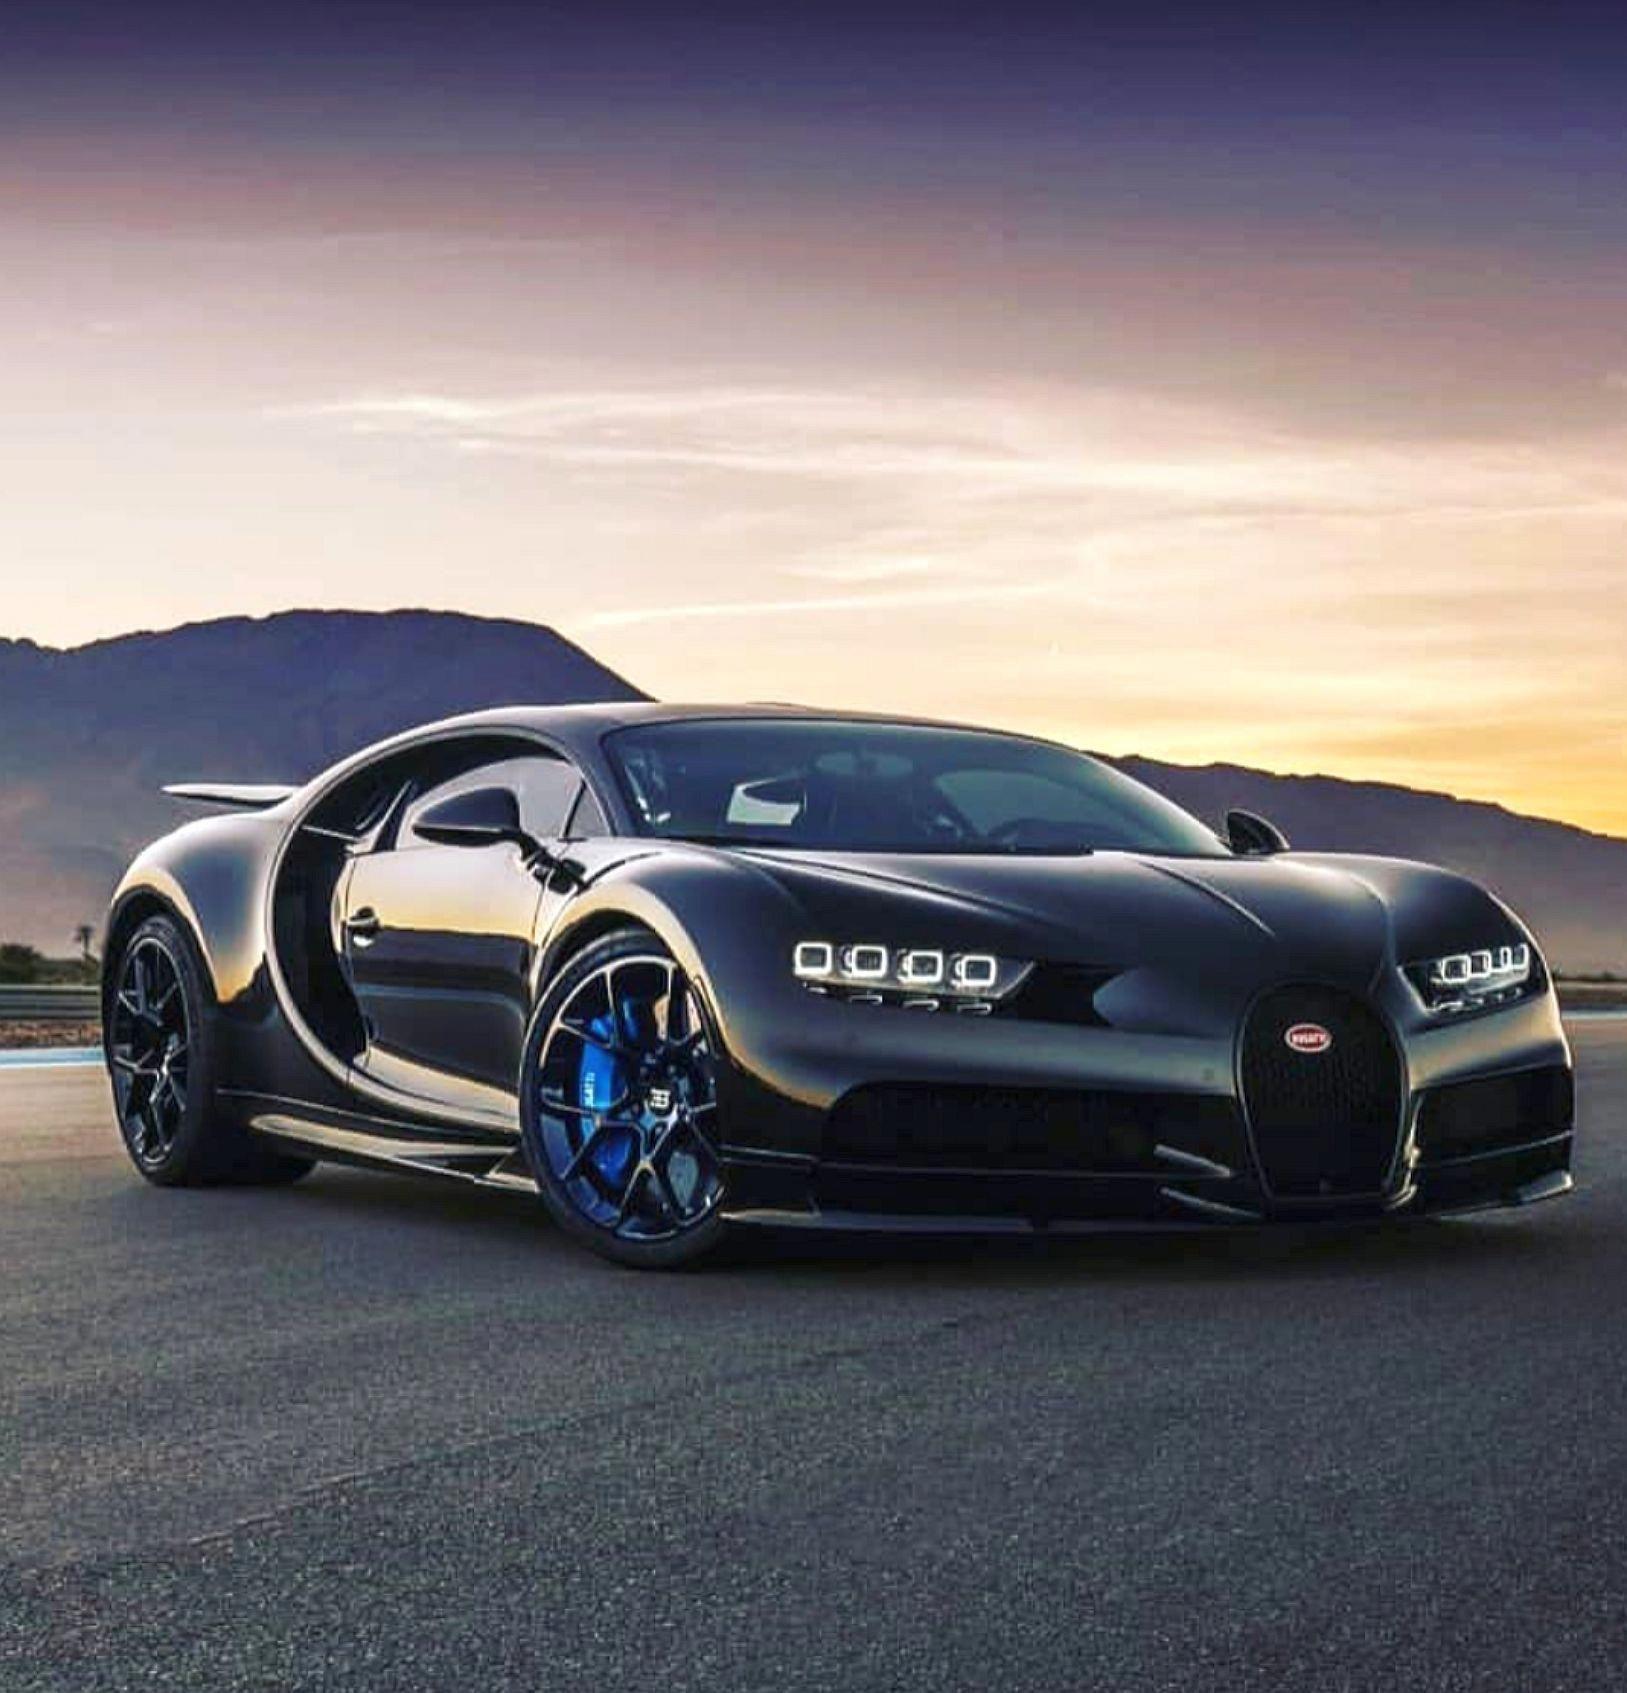 Bugatti Chiron Super Sport 300 Prototype 2019 Wallpapers: Sports Cars Bugatti Veyron